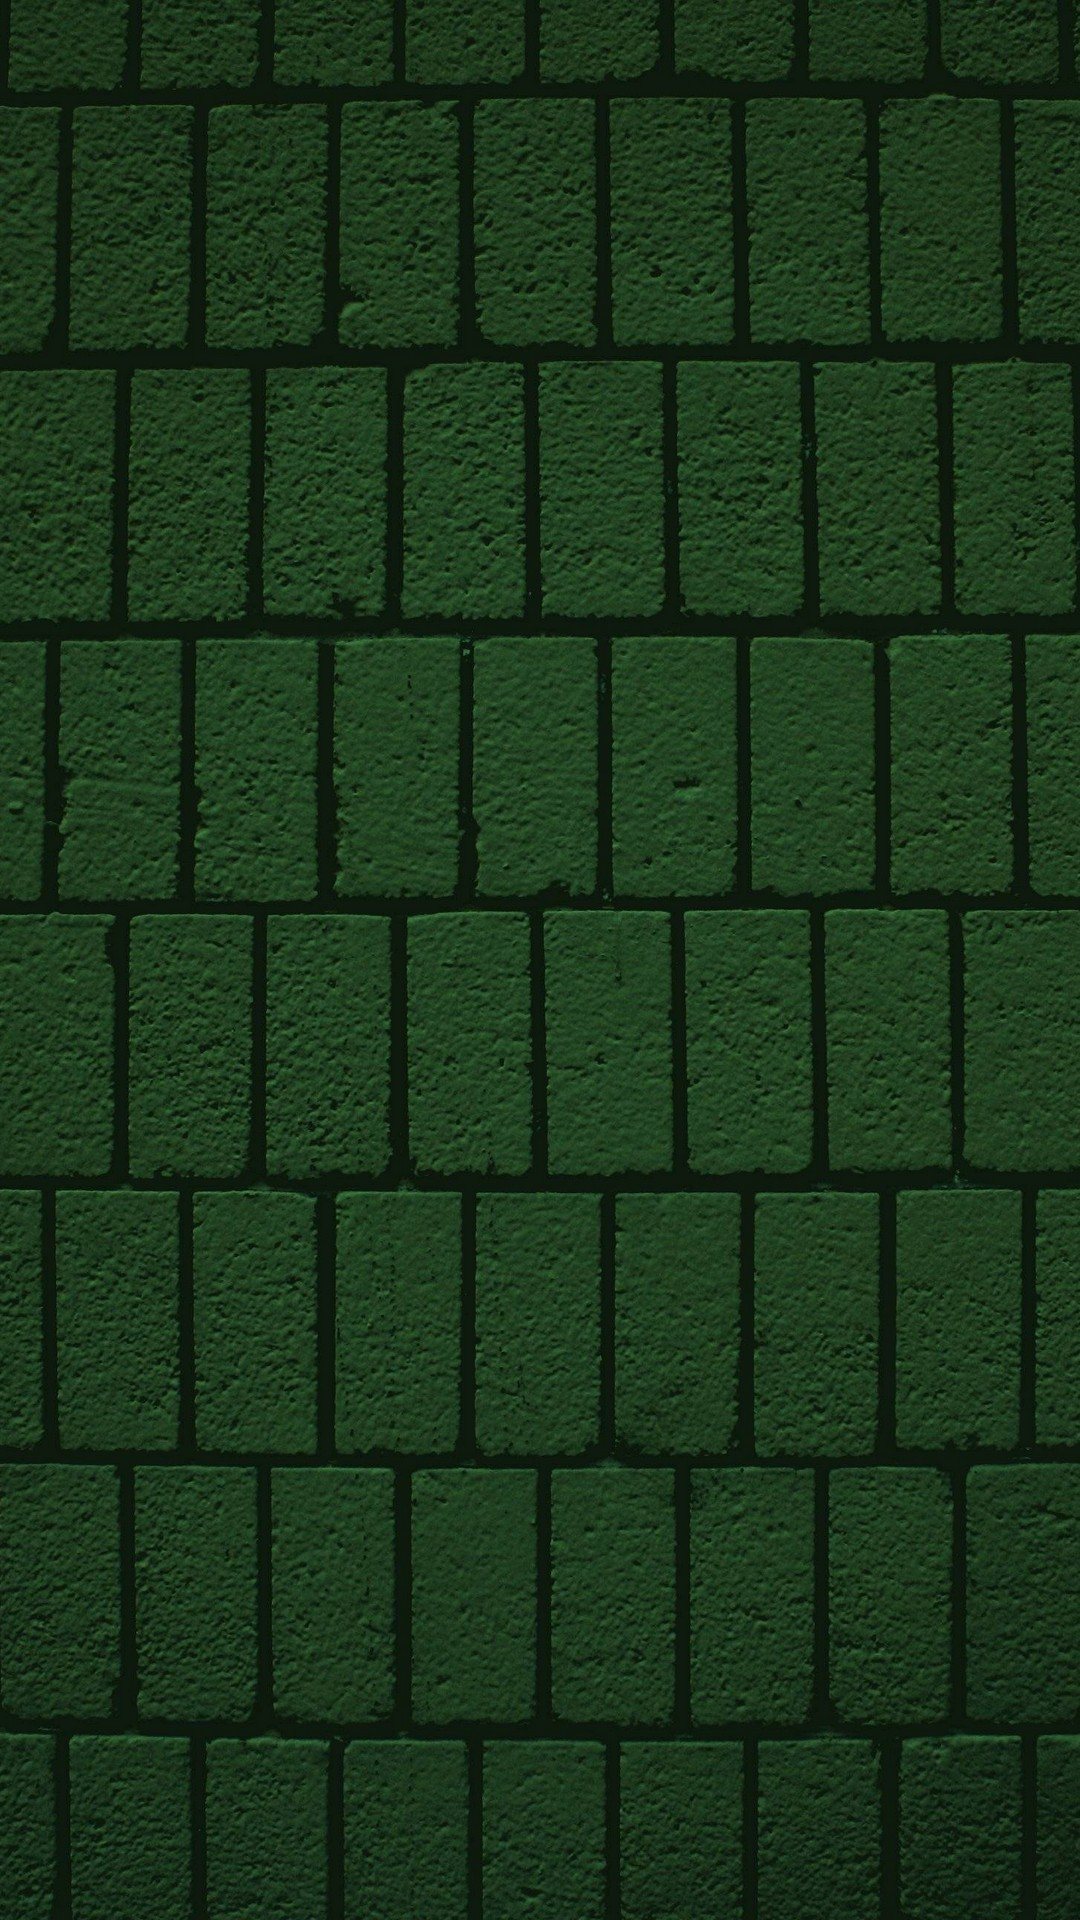 Dark Green Wallpaper Iphone 2020 3d Iphone Wallpaper